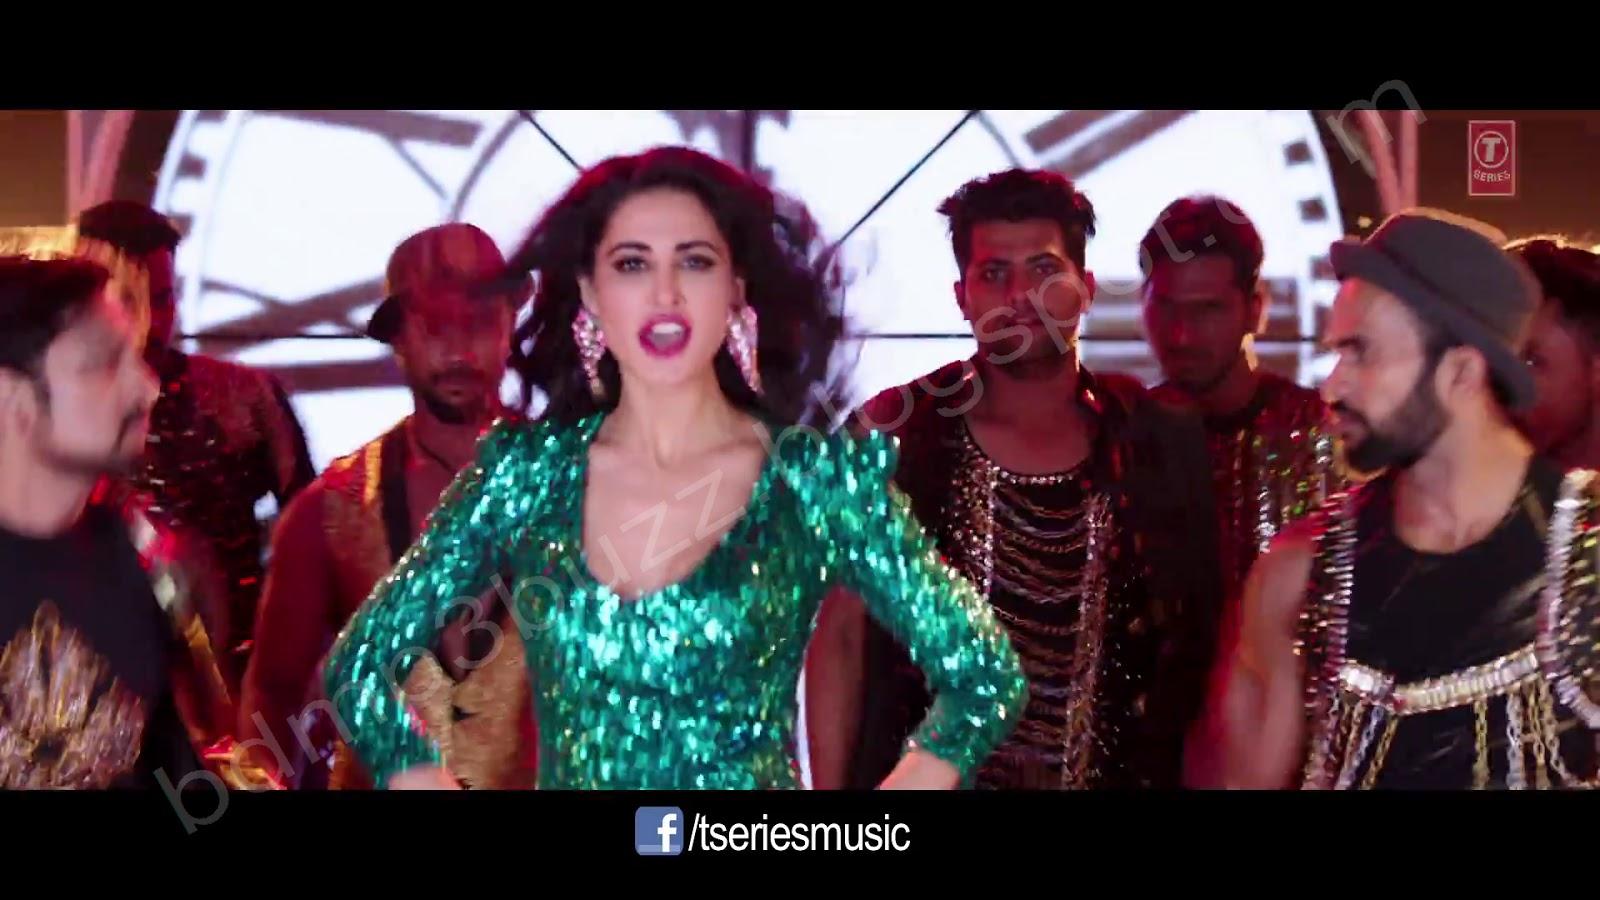 Oye oye new hd video song [azhar] emraan hashmi, nargis fakhri.